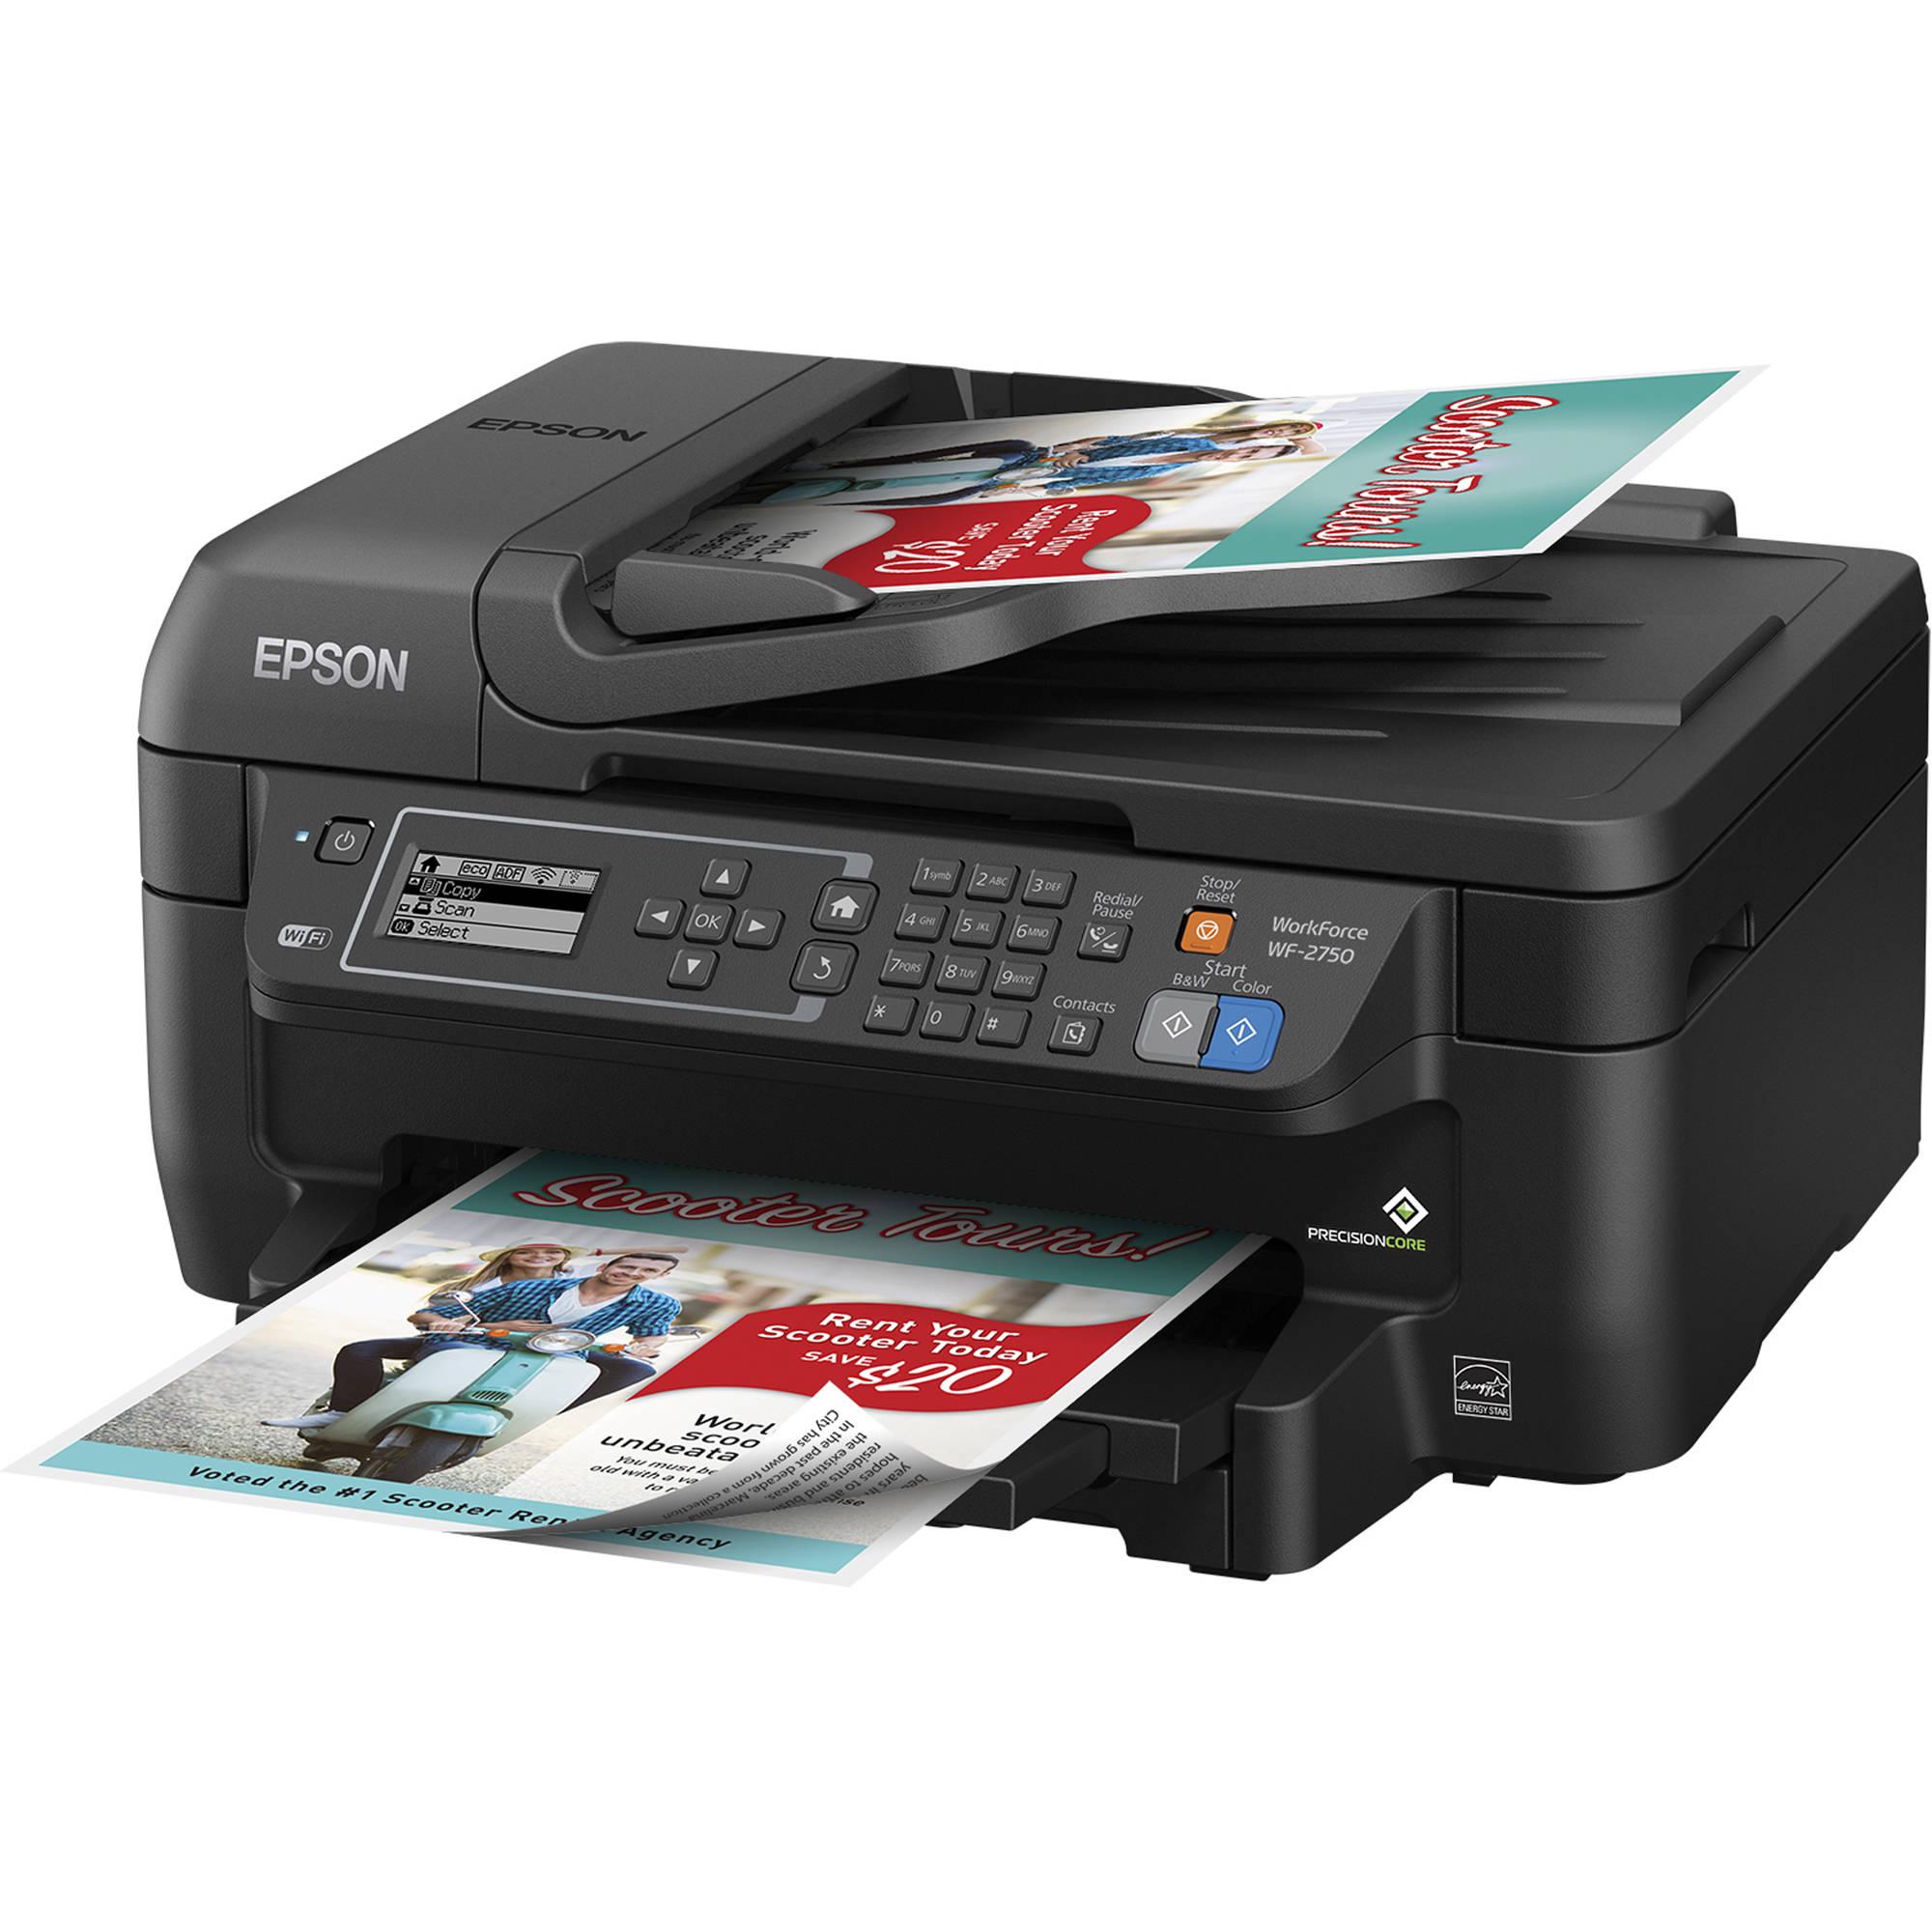 Epson WorkForce WF-2750 All-in-One Inkjet Printer